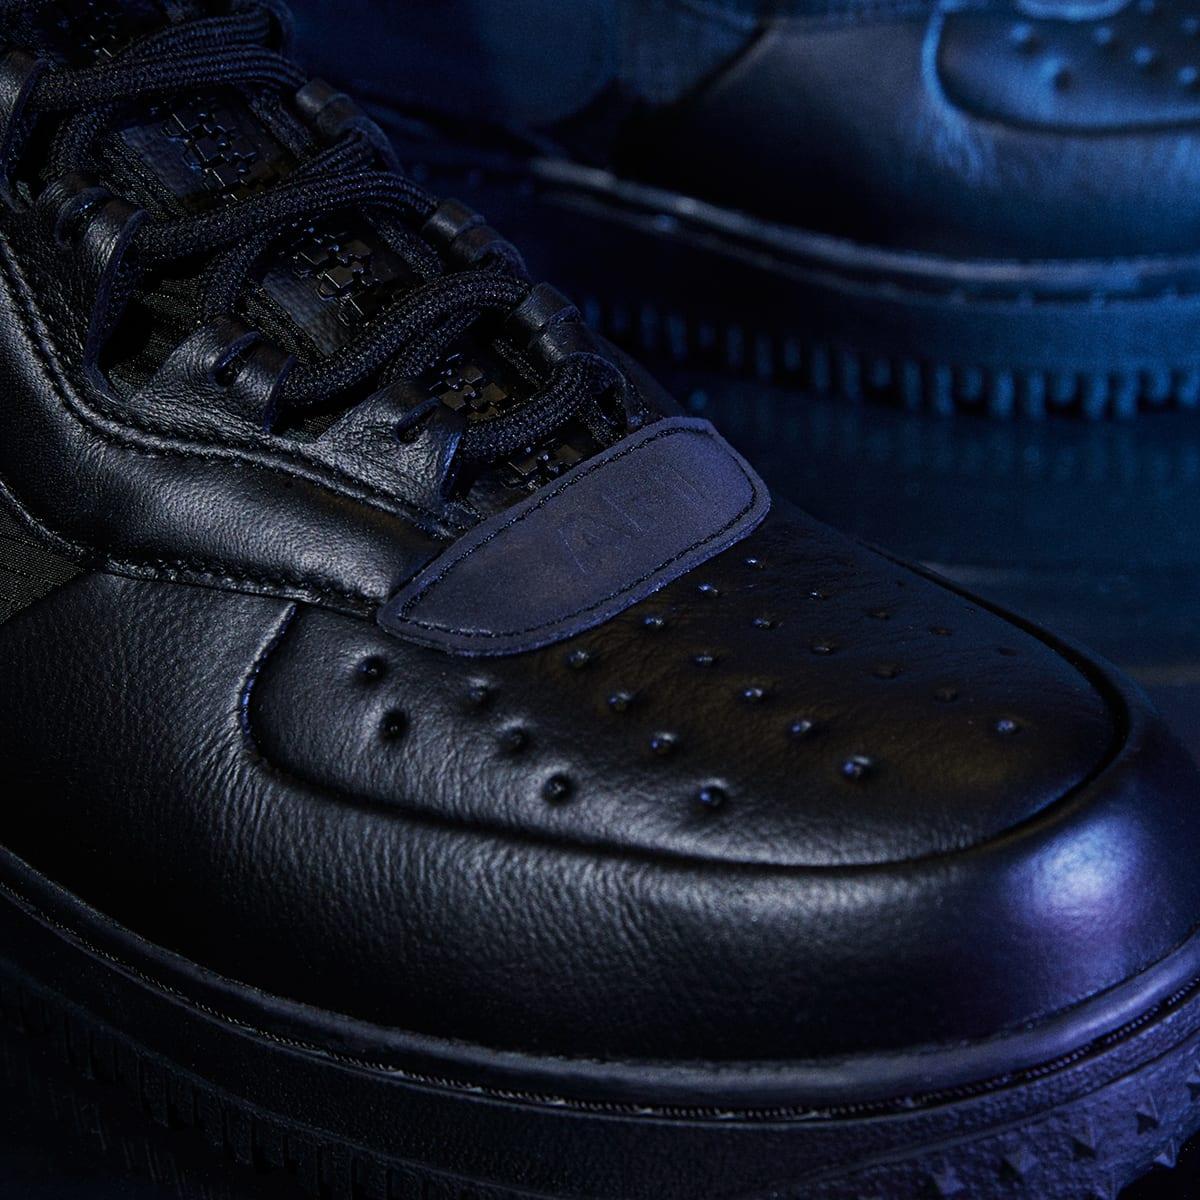 Nike Air Force 1 WTR GTX (Black & Anthracite)